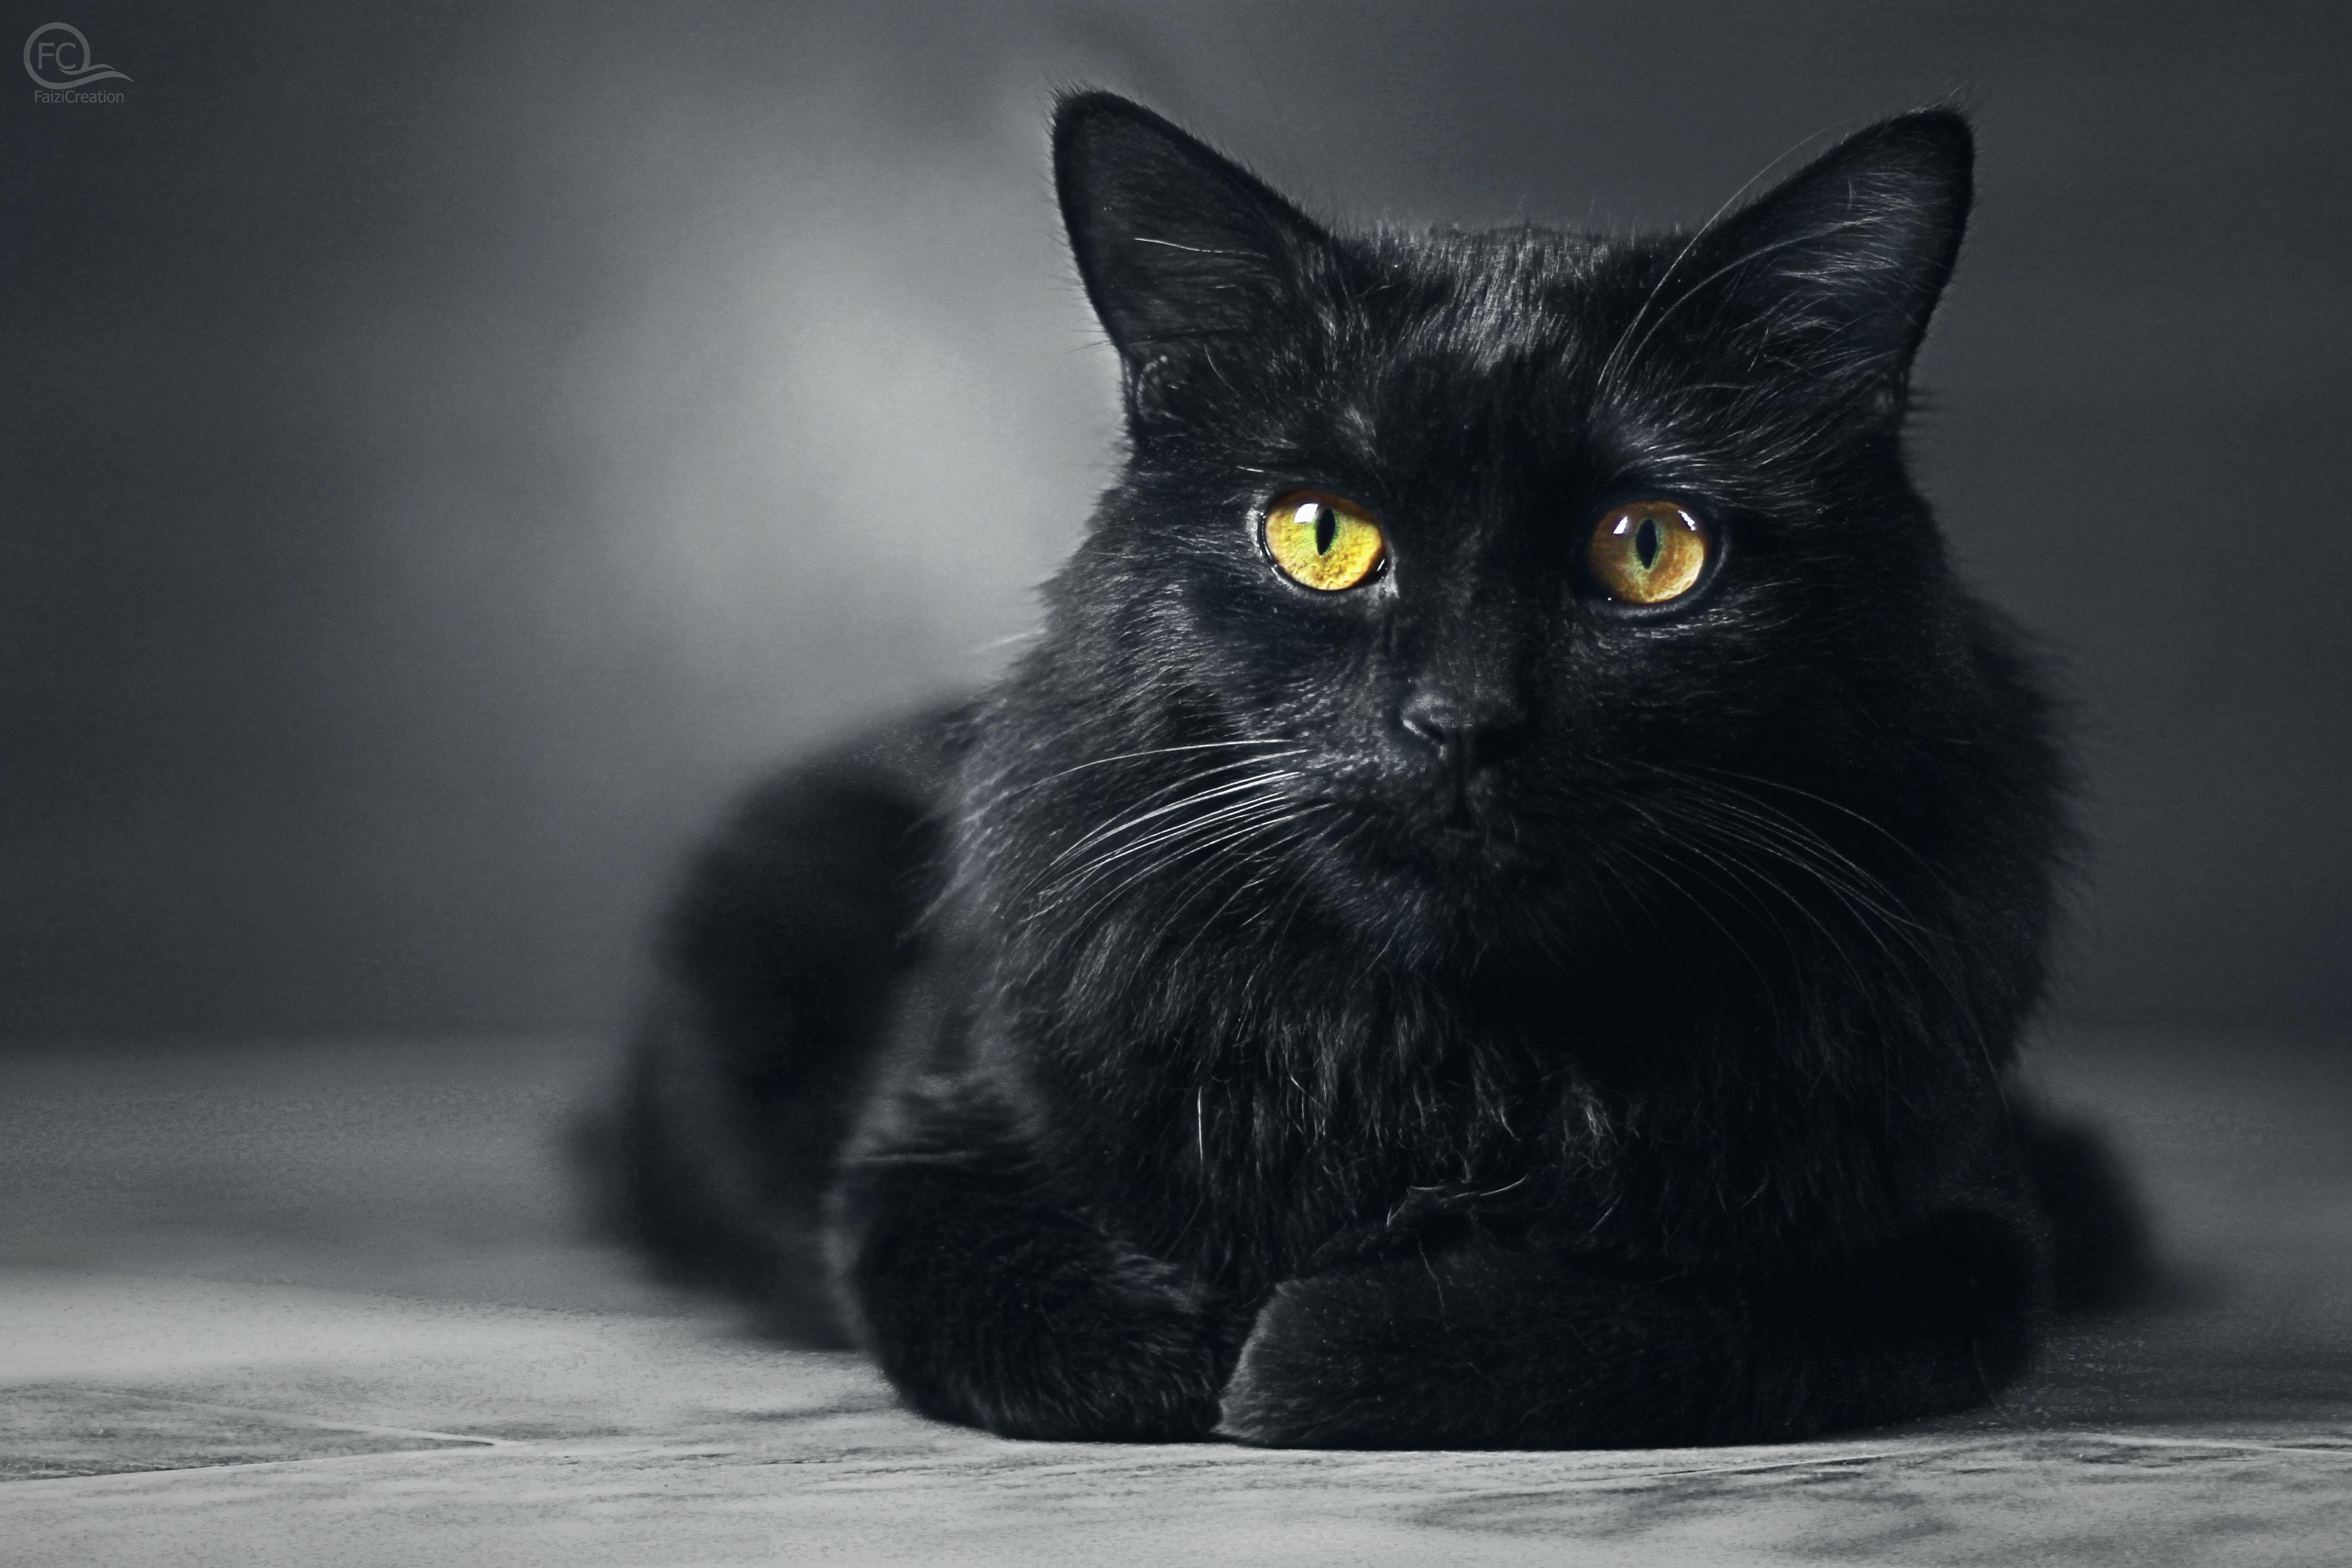 Free stock photo of black cat, black cat wallpaper, cat, FaiziCreation